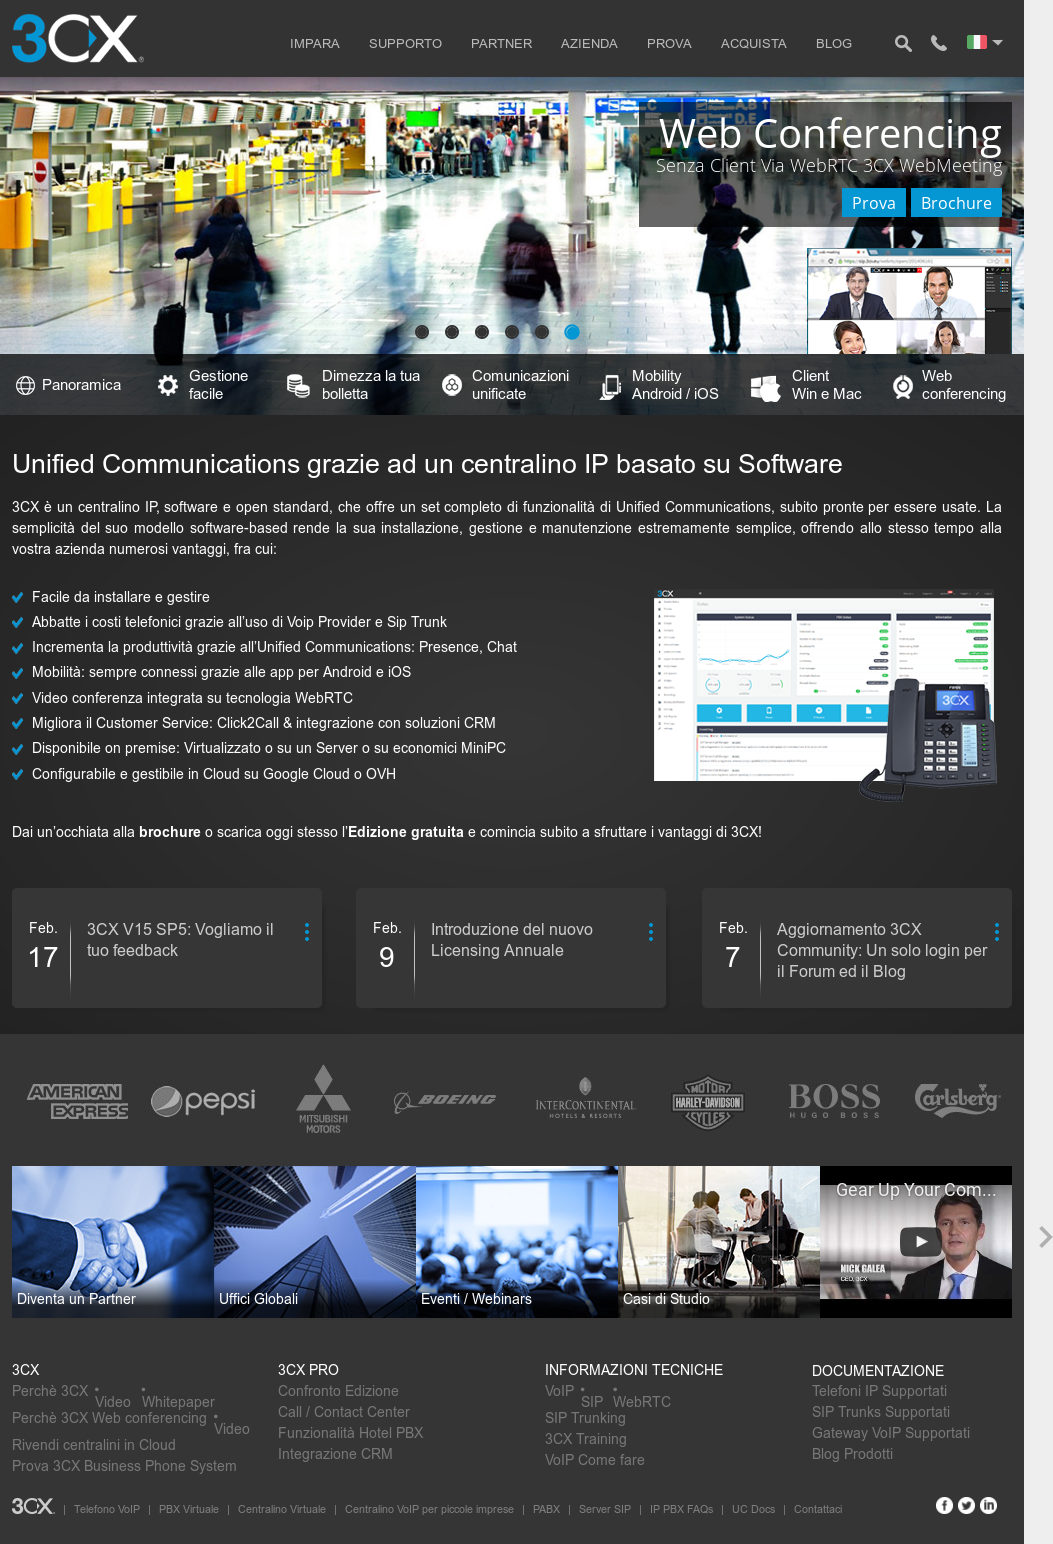 3Cx Competitors, Revenue and Employees - Owler Company Profile